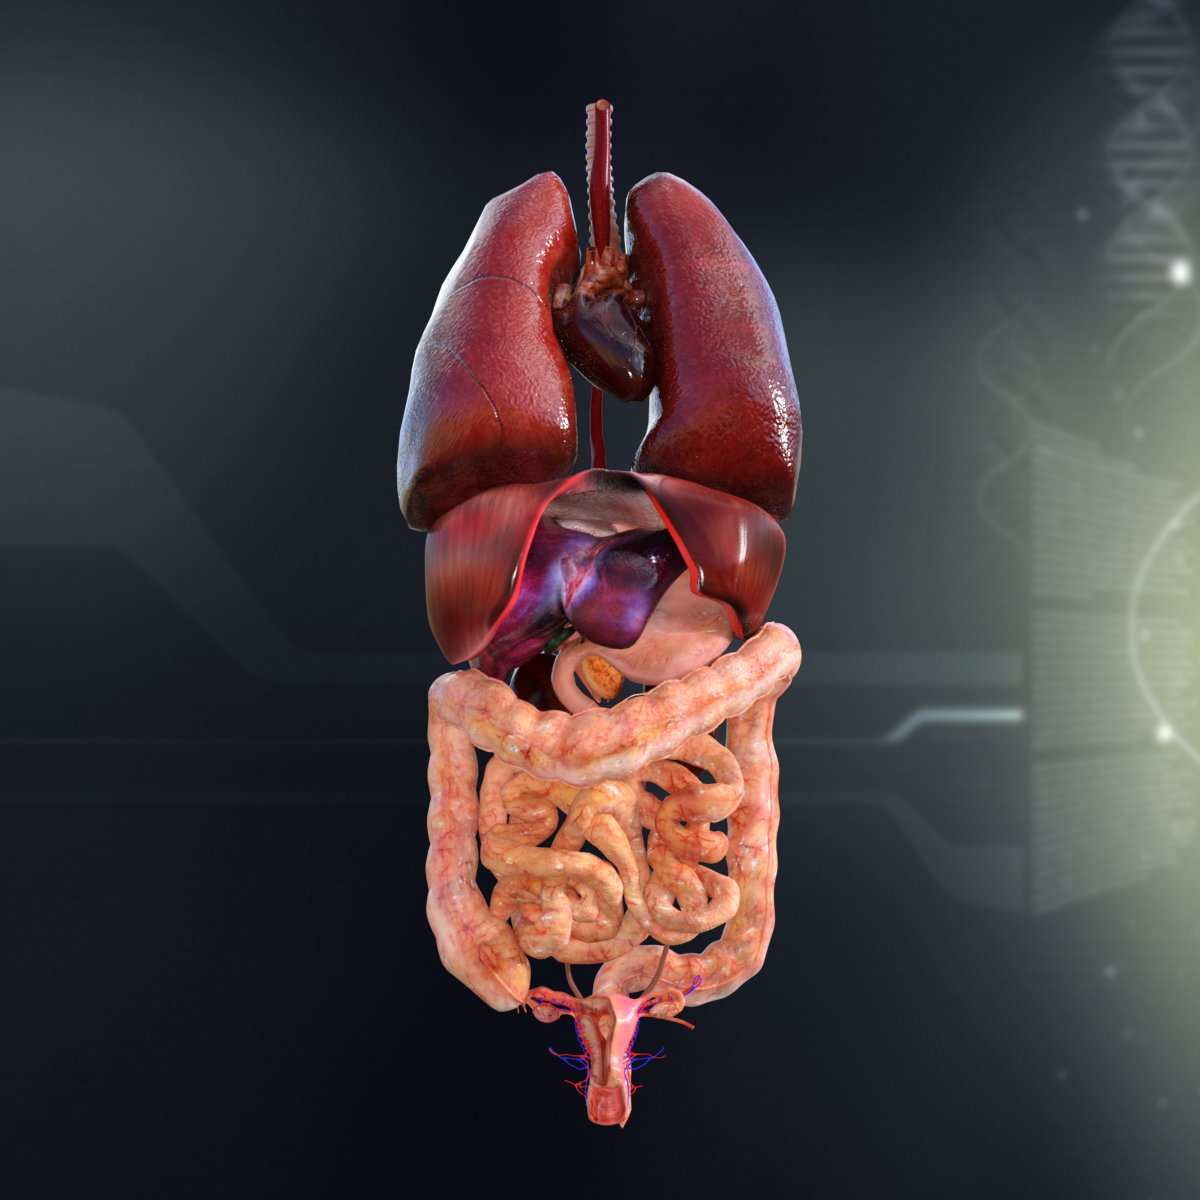 Human Female Internal Organs Anatomy 3D Model in Anatomy 3DExport